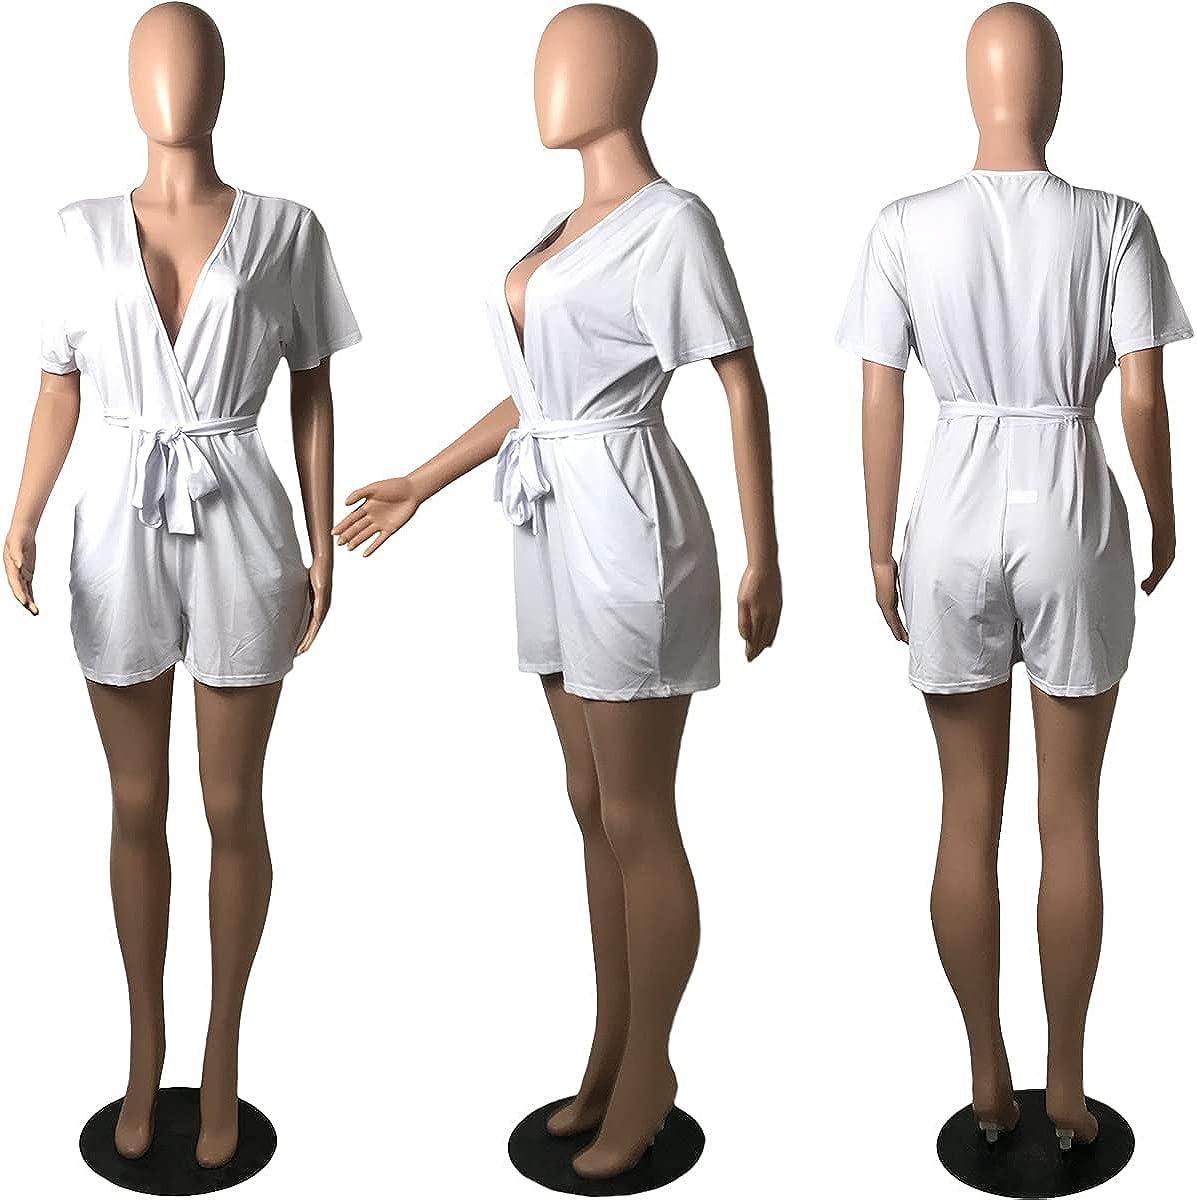 Waesoaen Plus Size Rompers for Women Casual Short Sleeve V Neck Belted Short Jumpsuit Romper with Pockets L-5XL